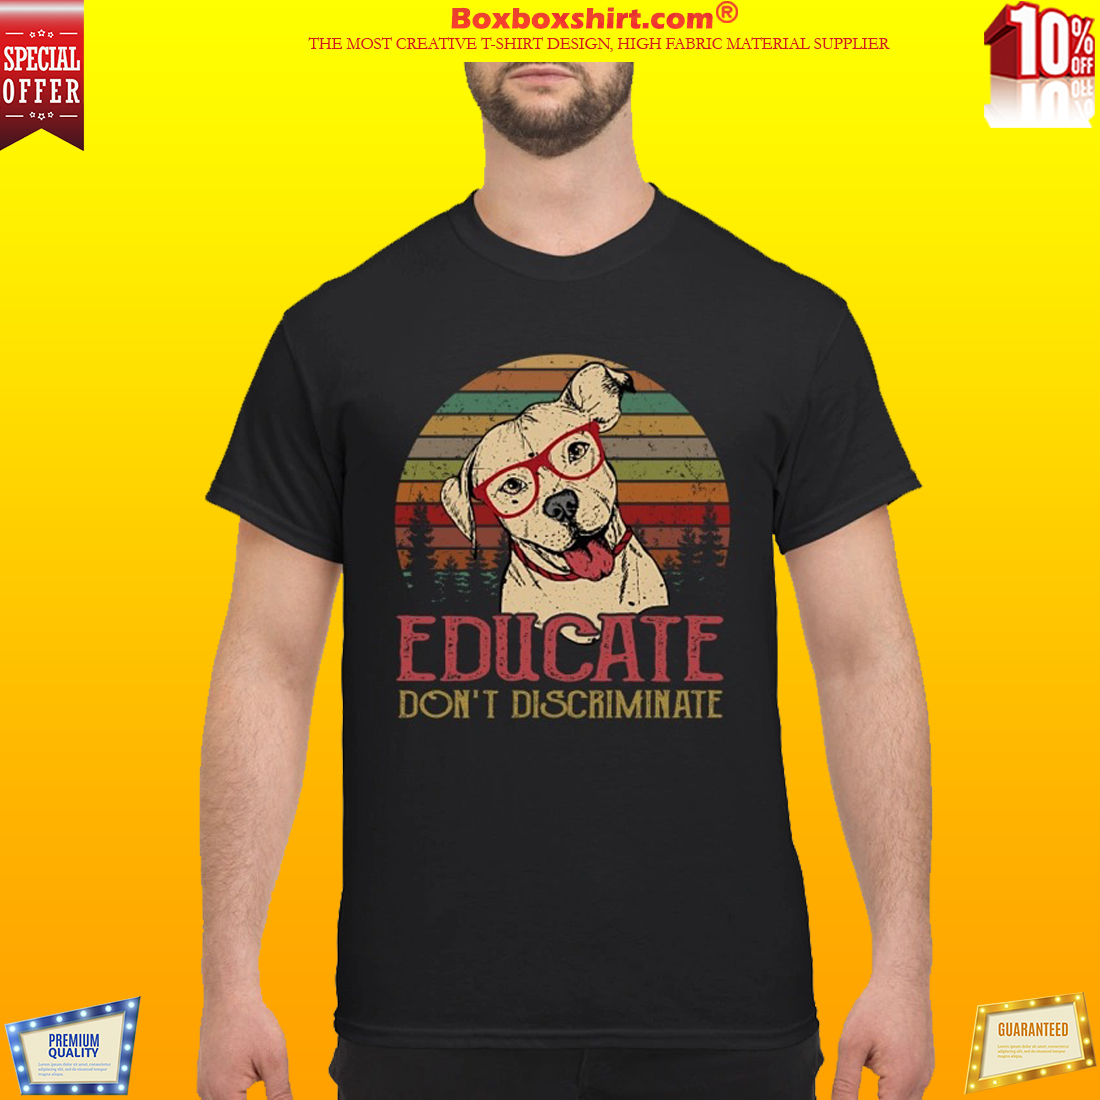 Dog educate don't discriminate shirt and sweatshirt